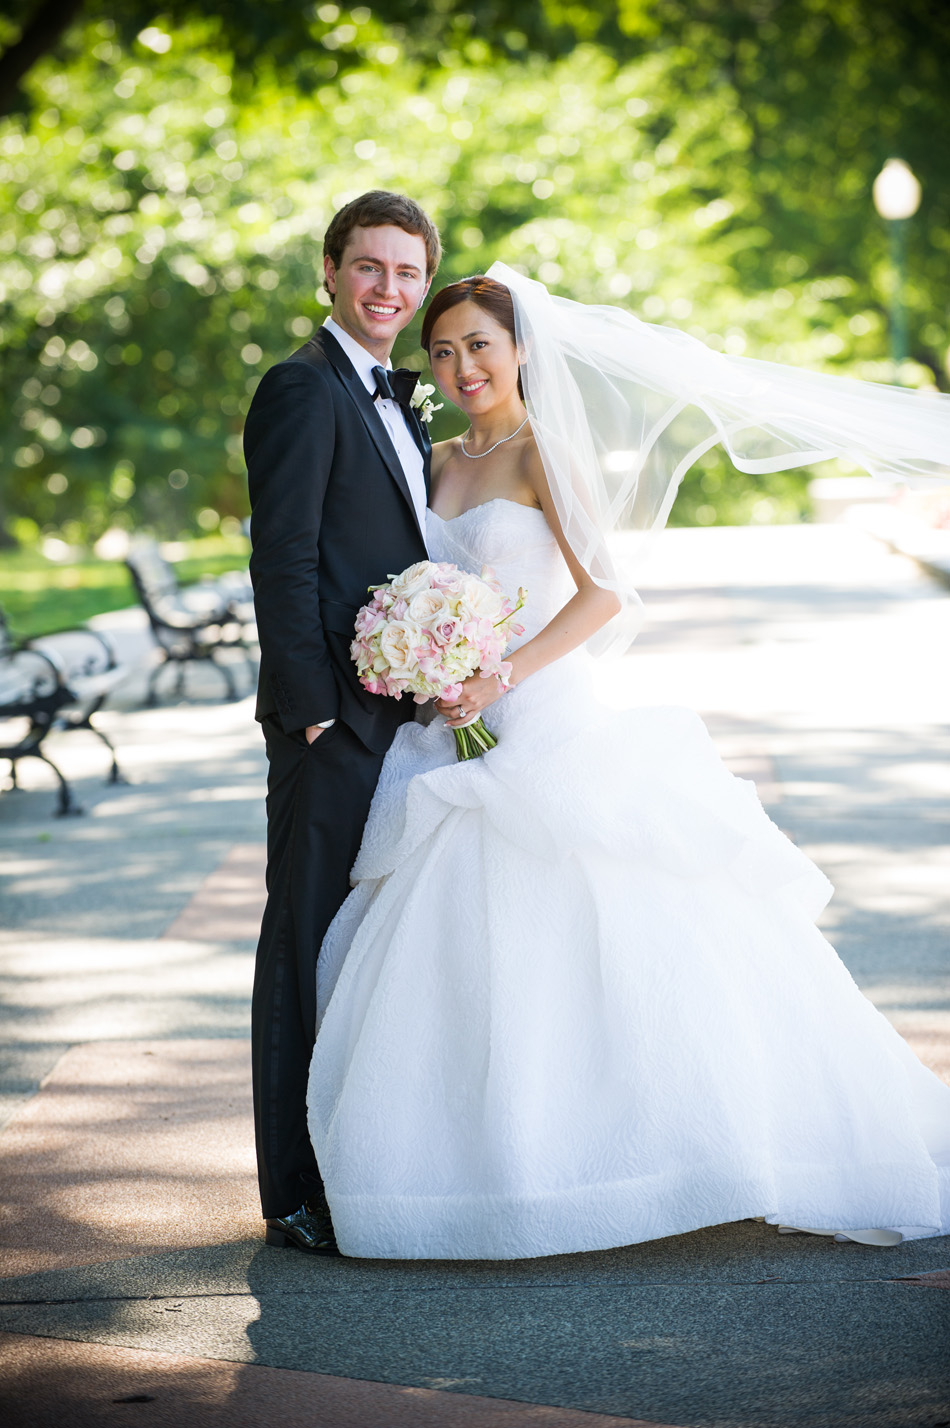 FreedPhotography_DC Wedding_023